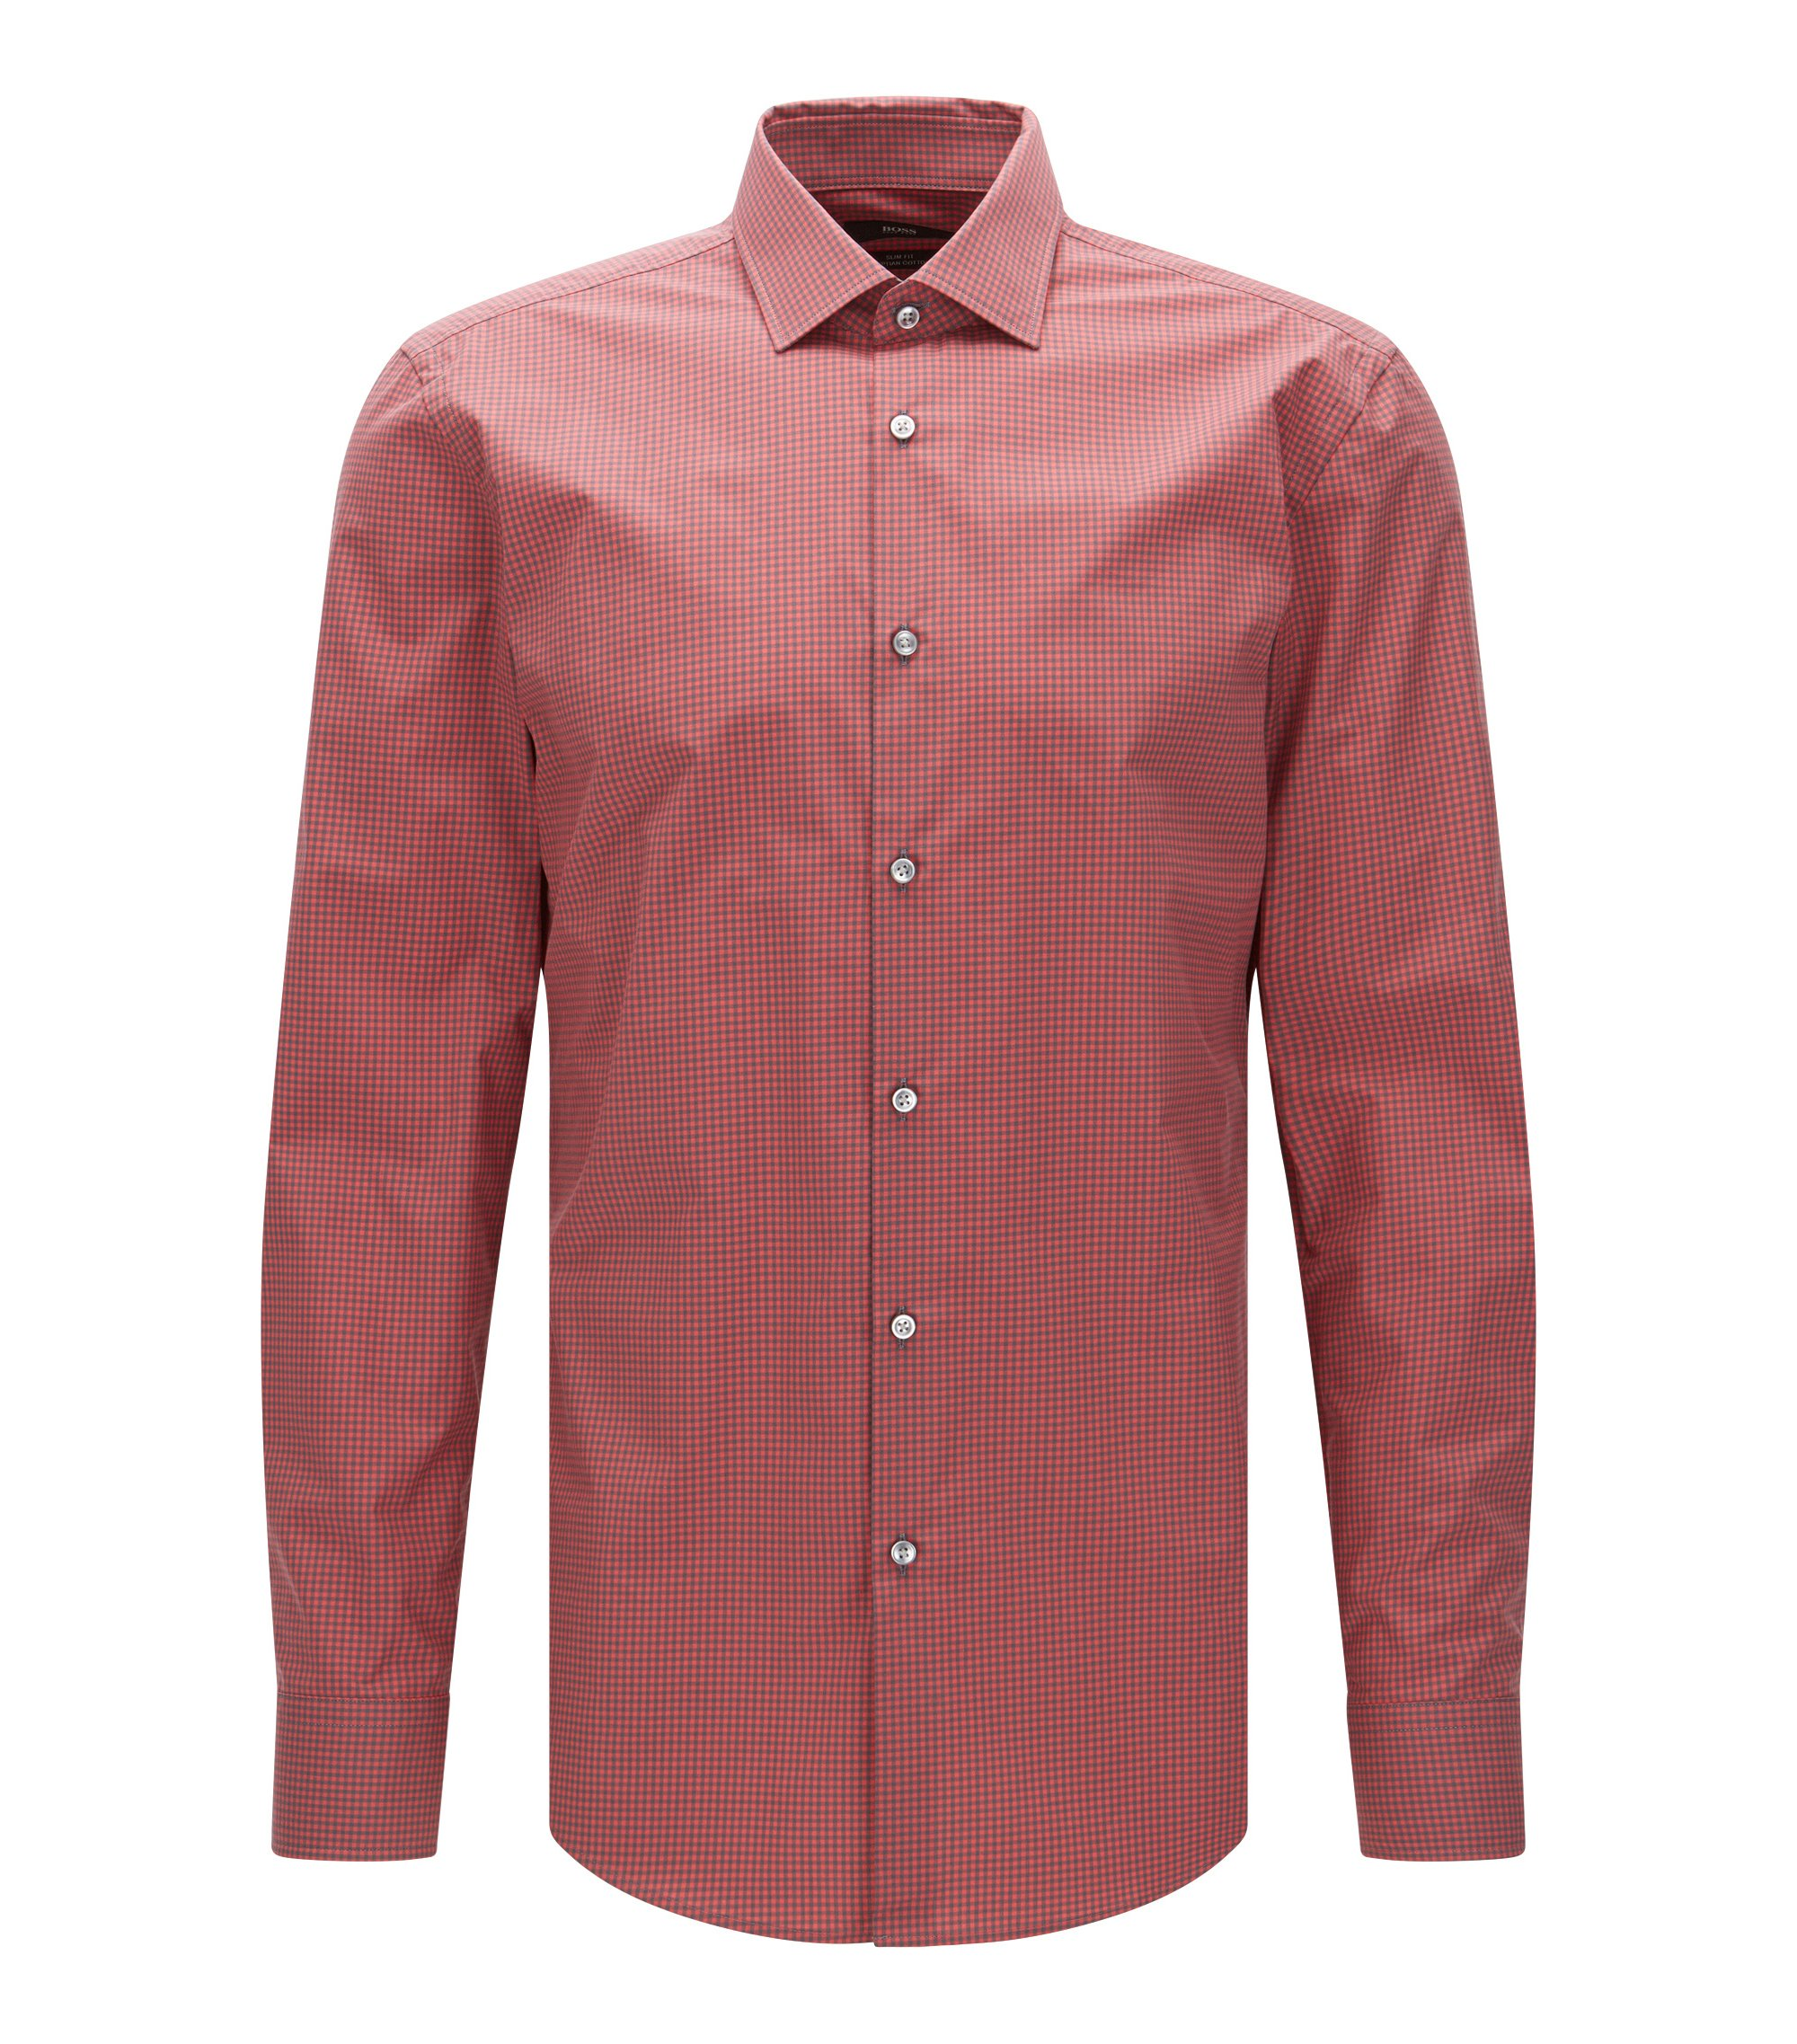 Gingham Egyptian Cotton Dress Shirt, Slim Fit | Jenno, Red